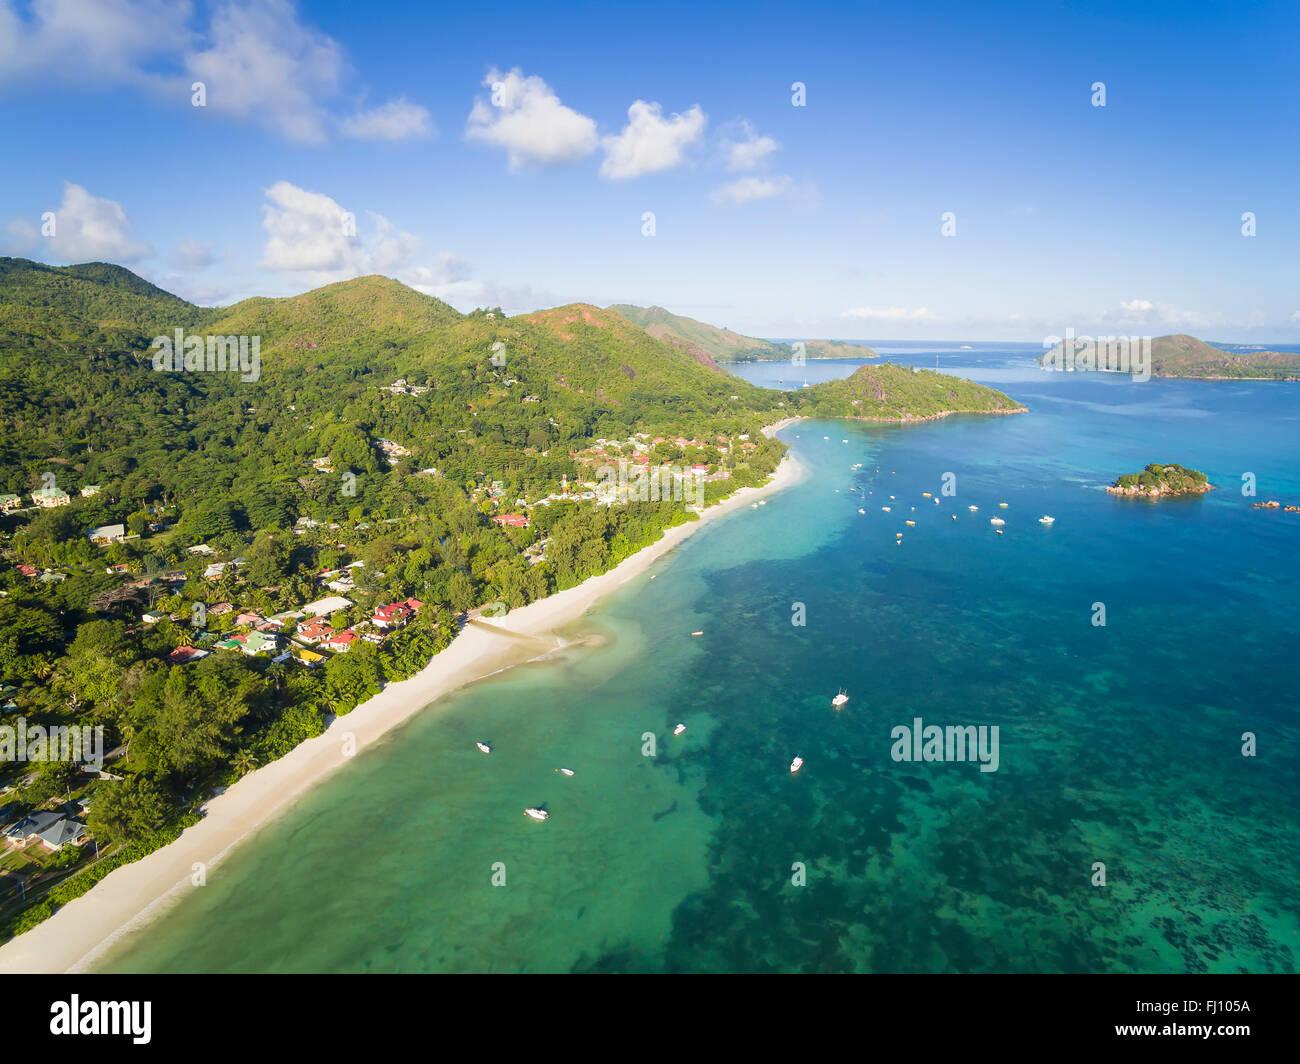 Seychelles, Praslin, Anse Volbert, Anse Volbert Village, Chauve Souris Island and Curieuse Island, aerial shot Stock Photo